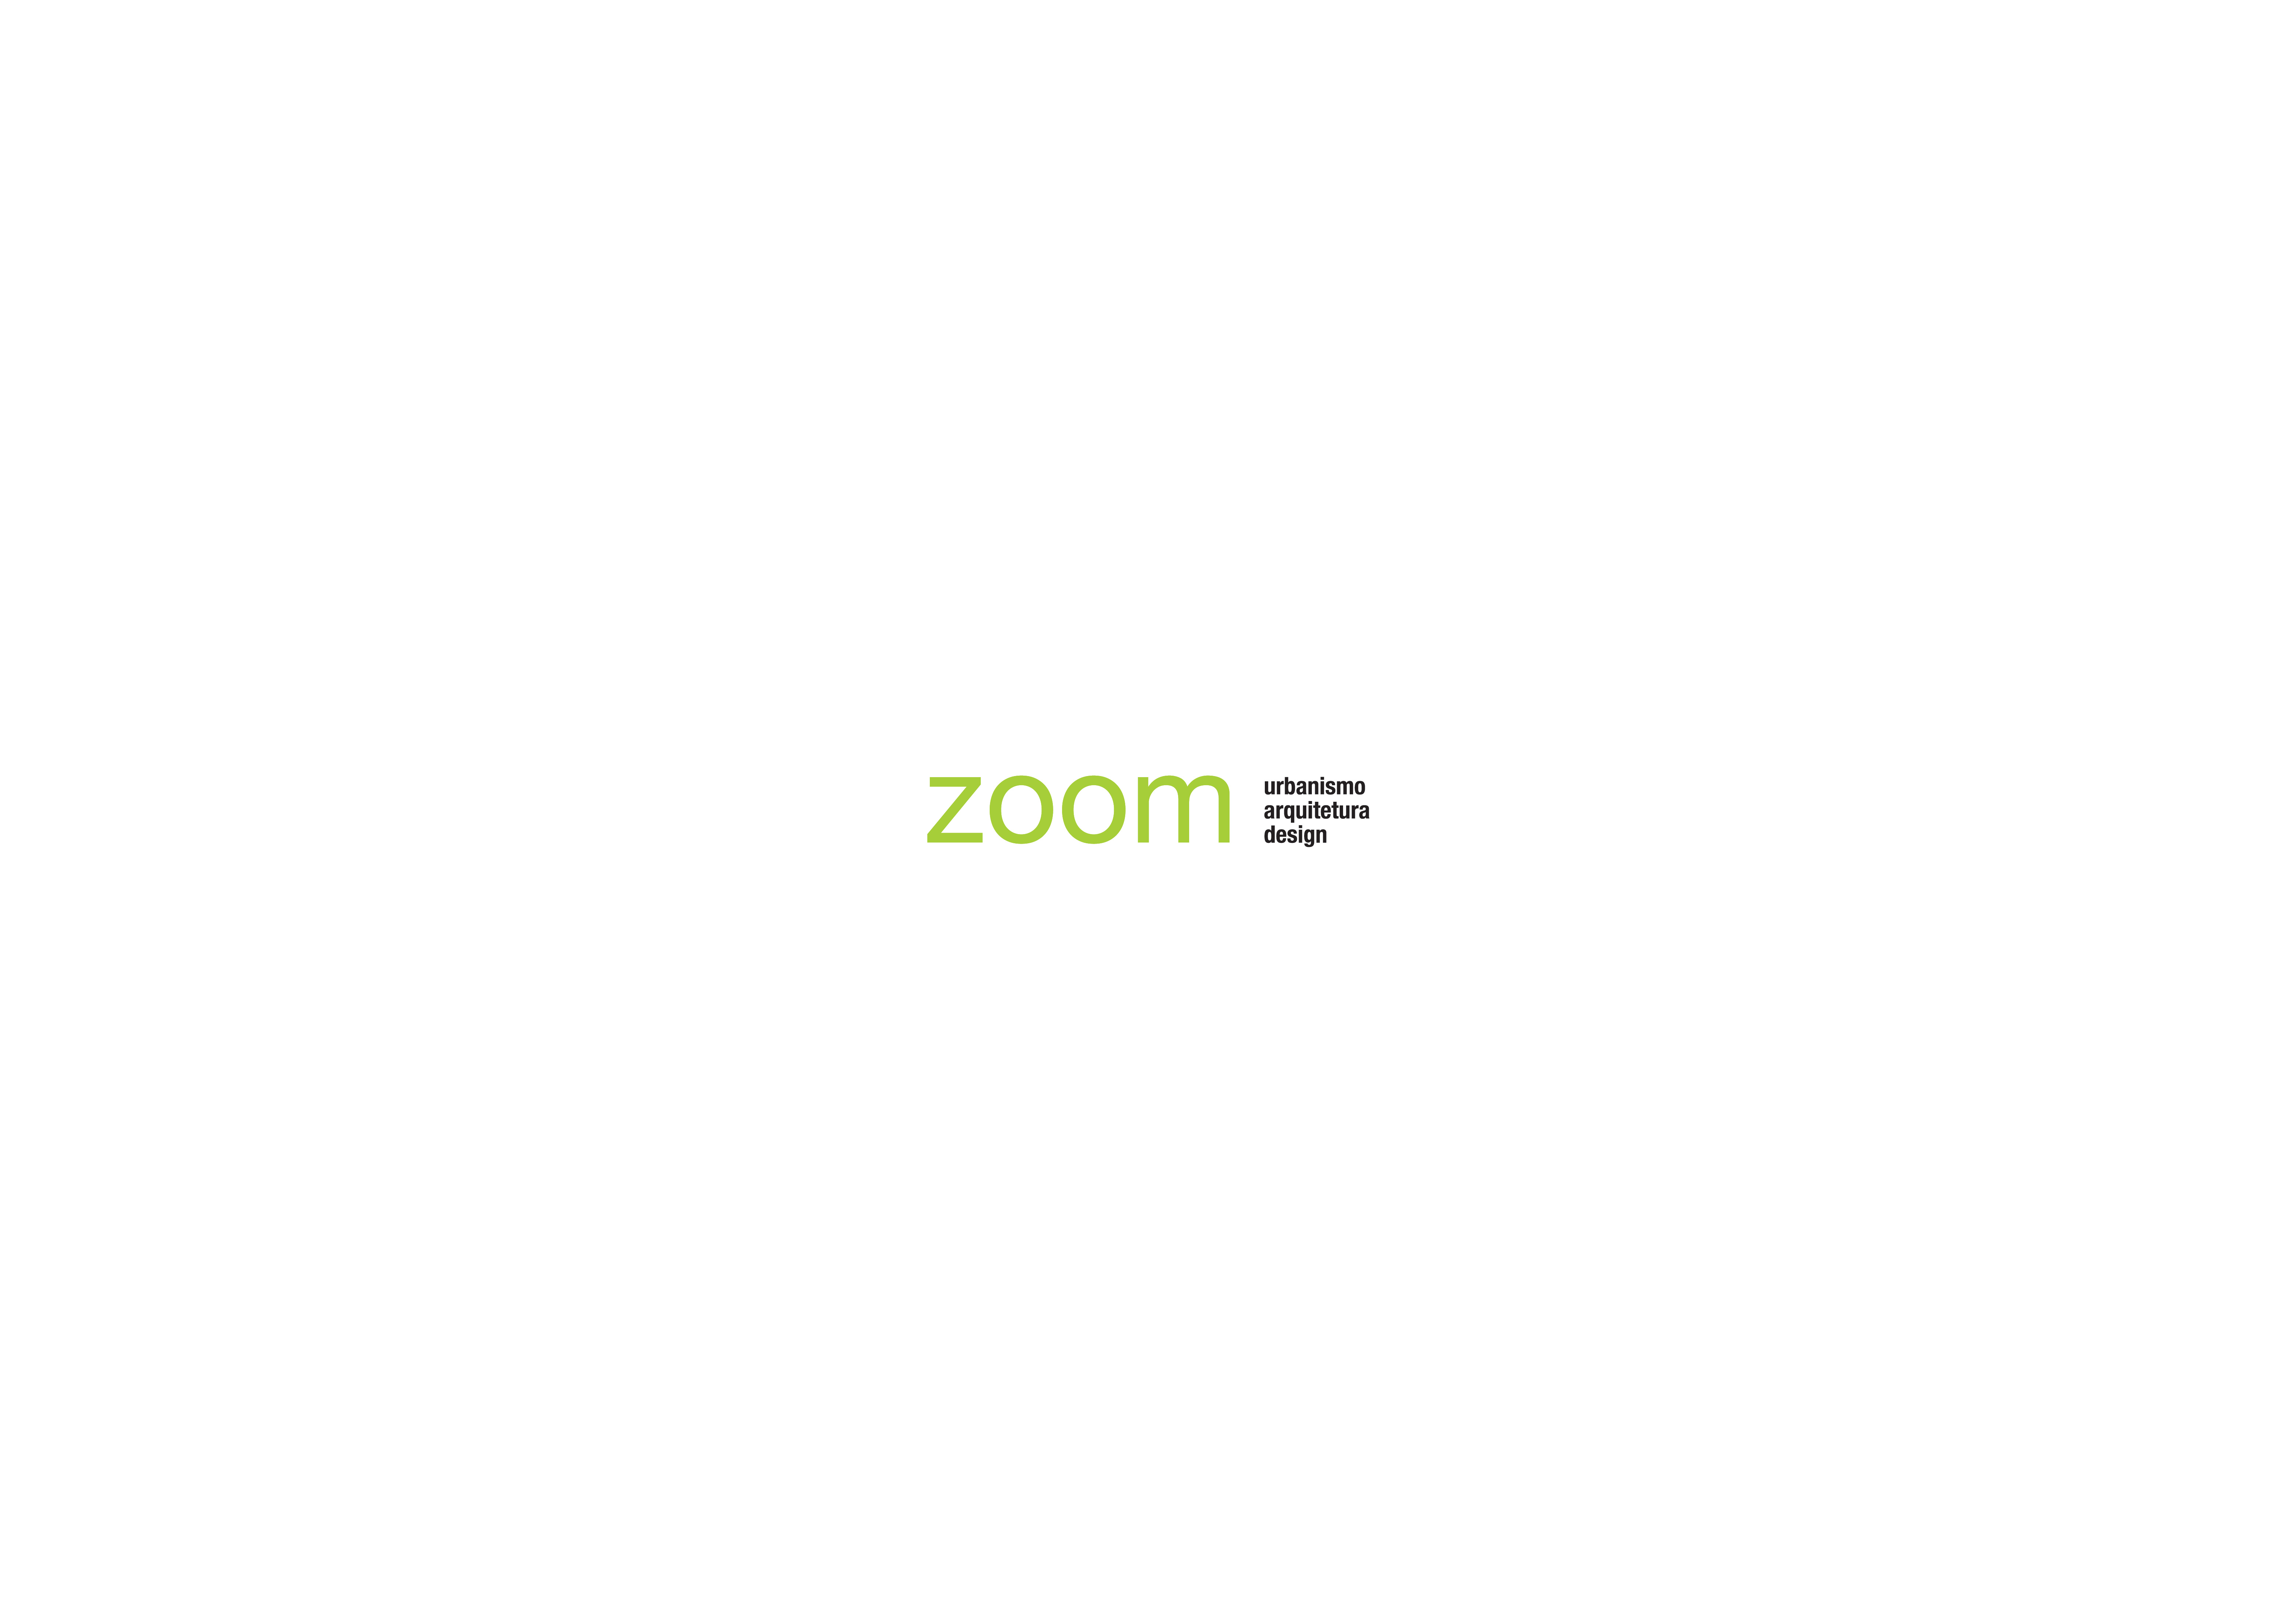 Zoom urbanismo arquitetura e design